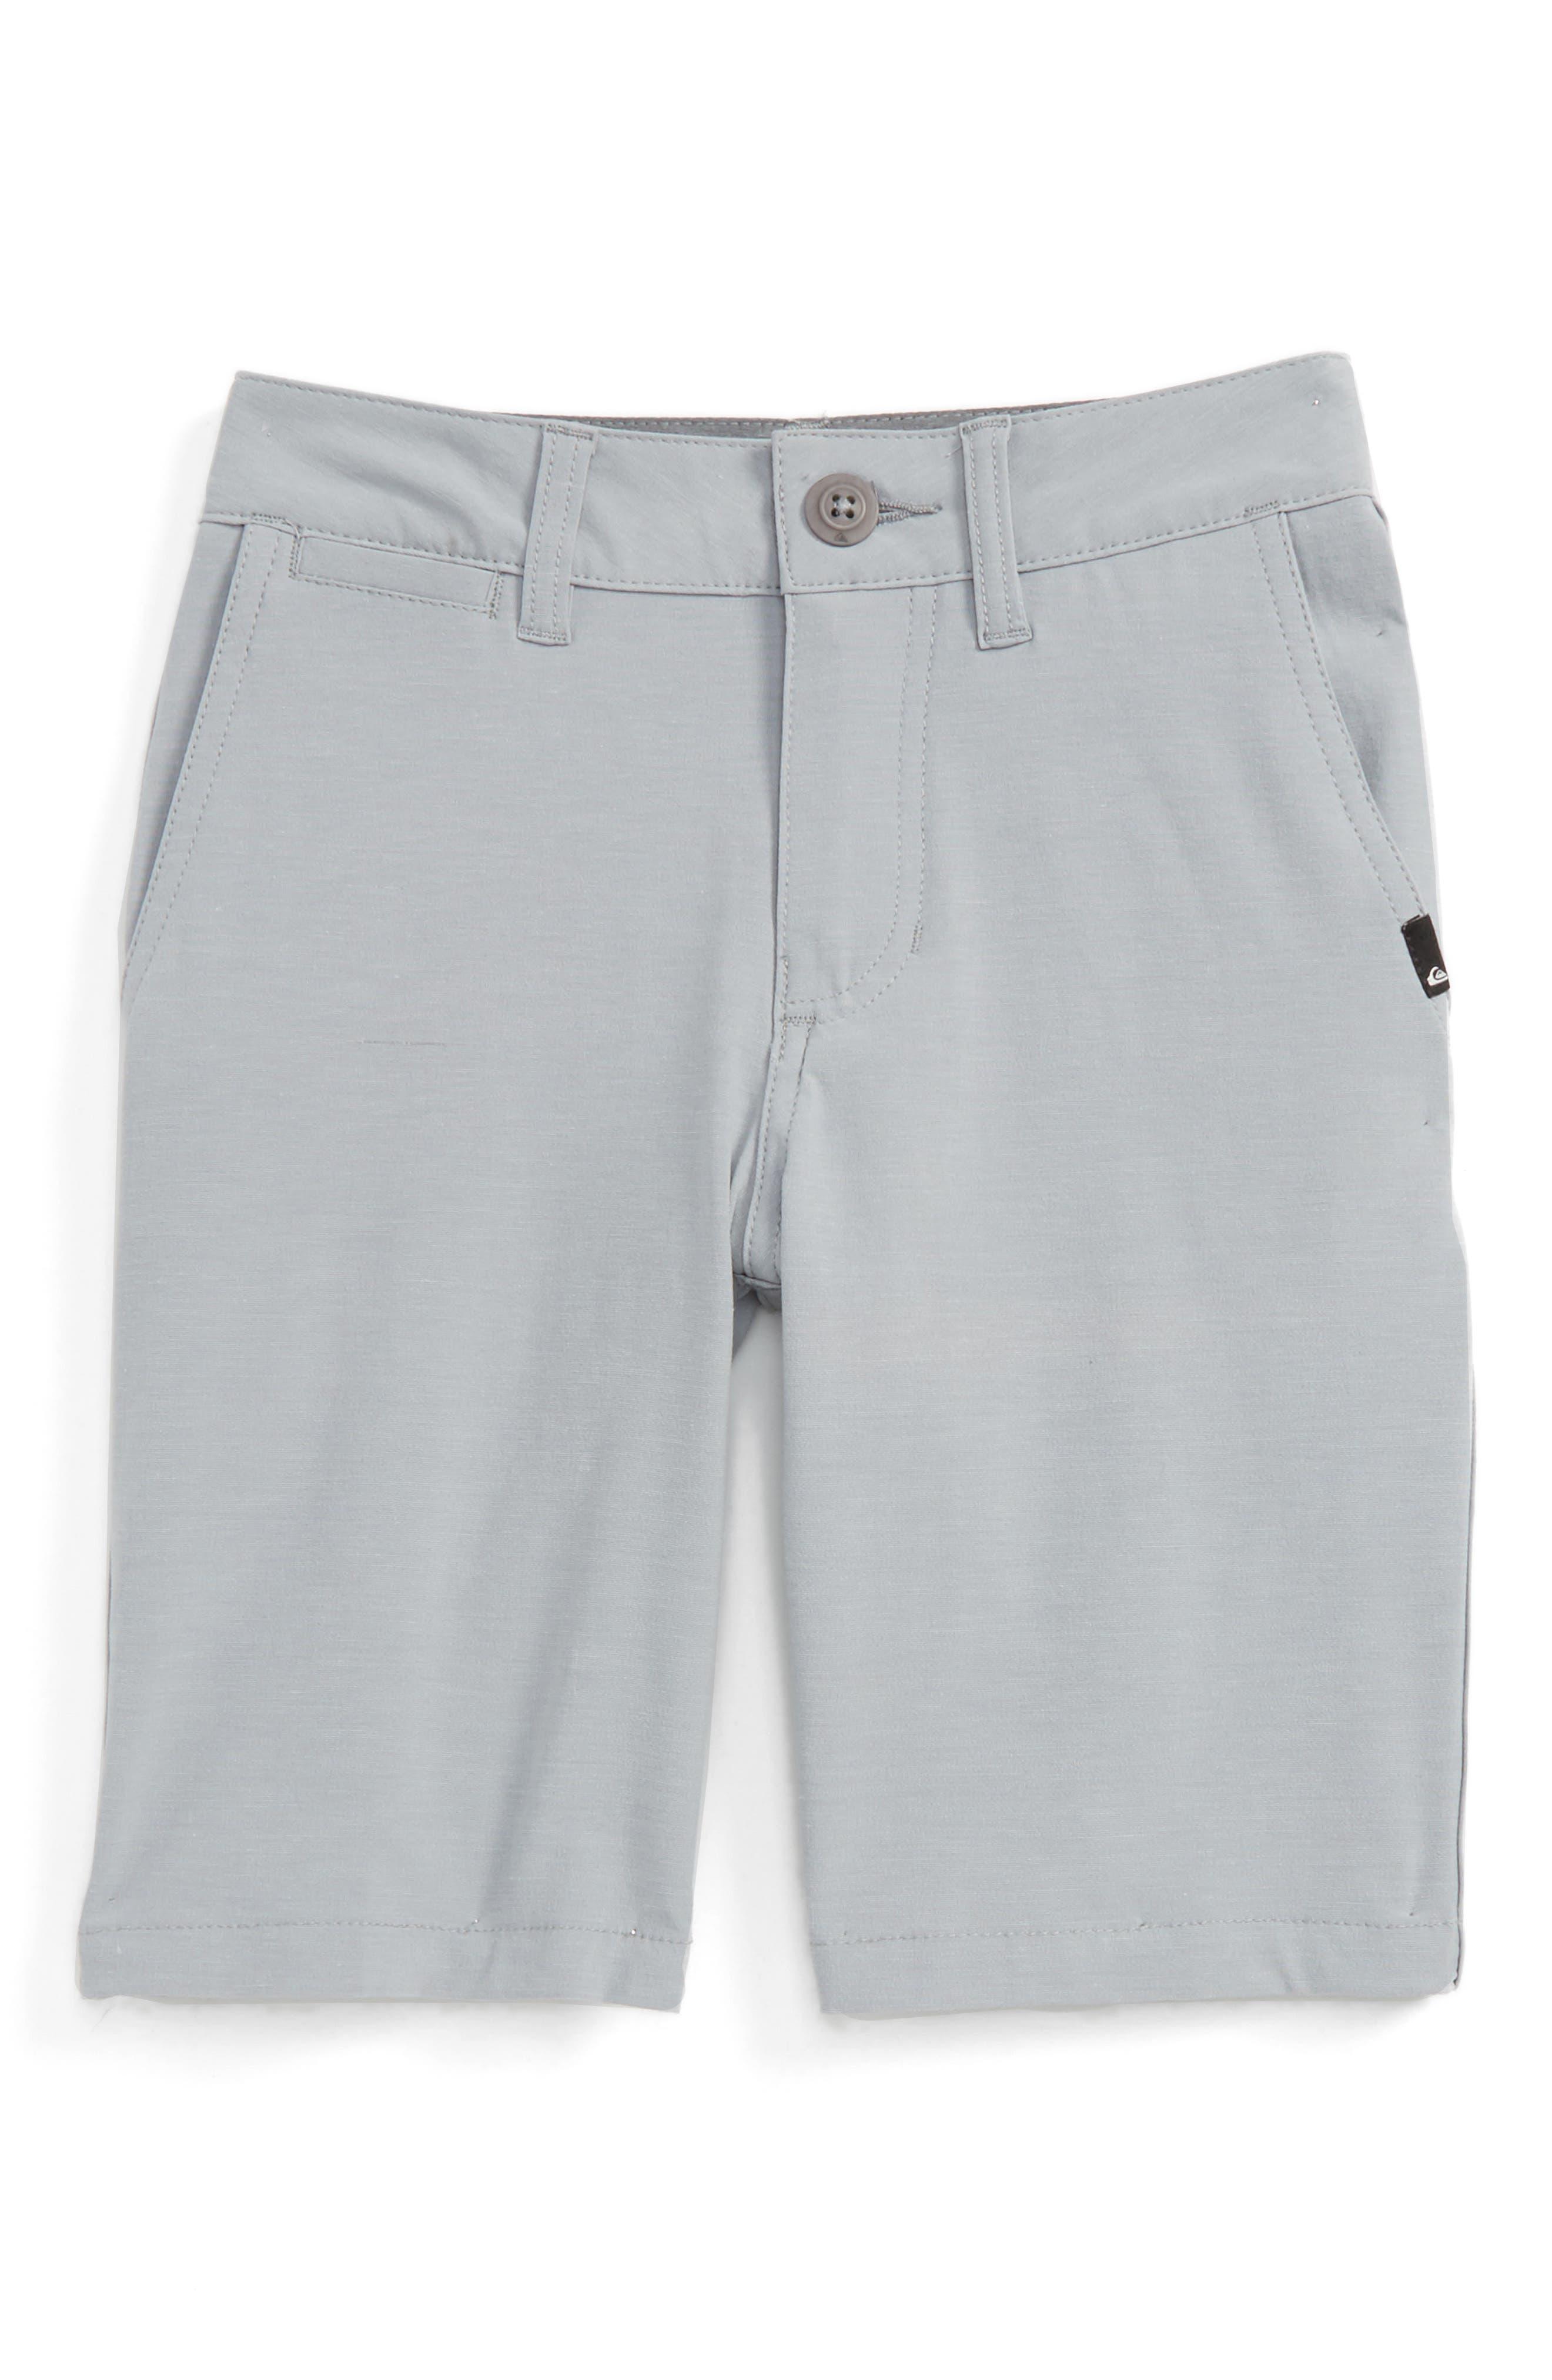 Amphibian Hybrid Shorts,                             Main thumbnail 3, color,